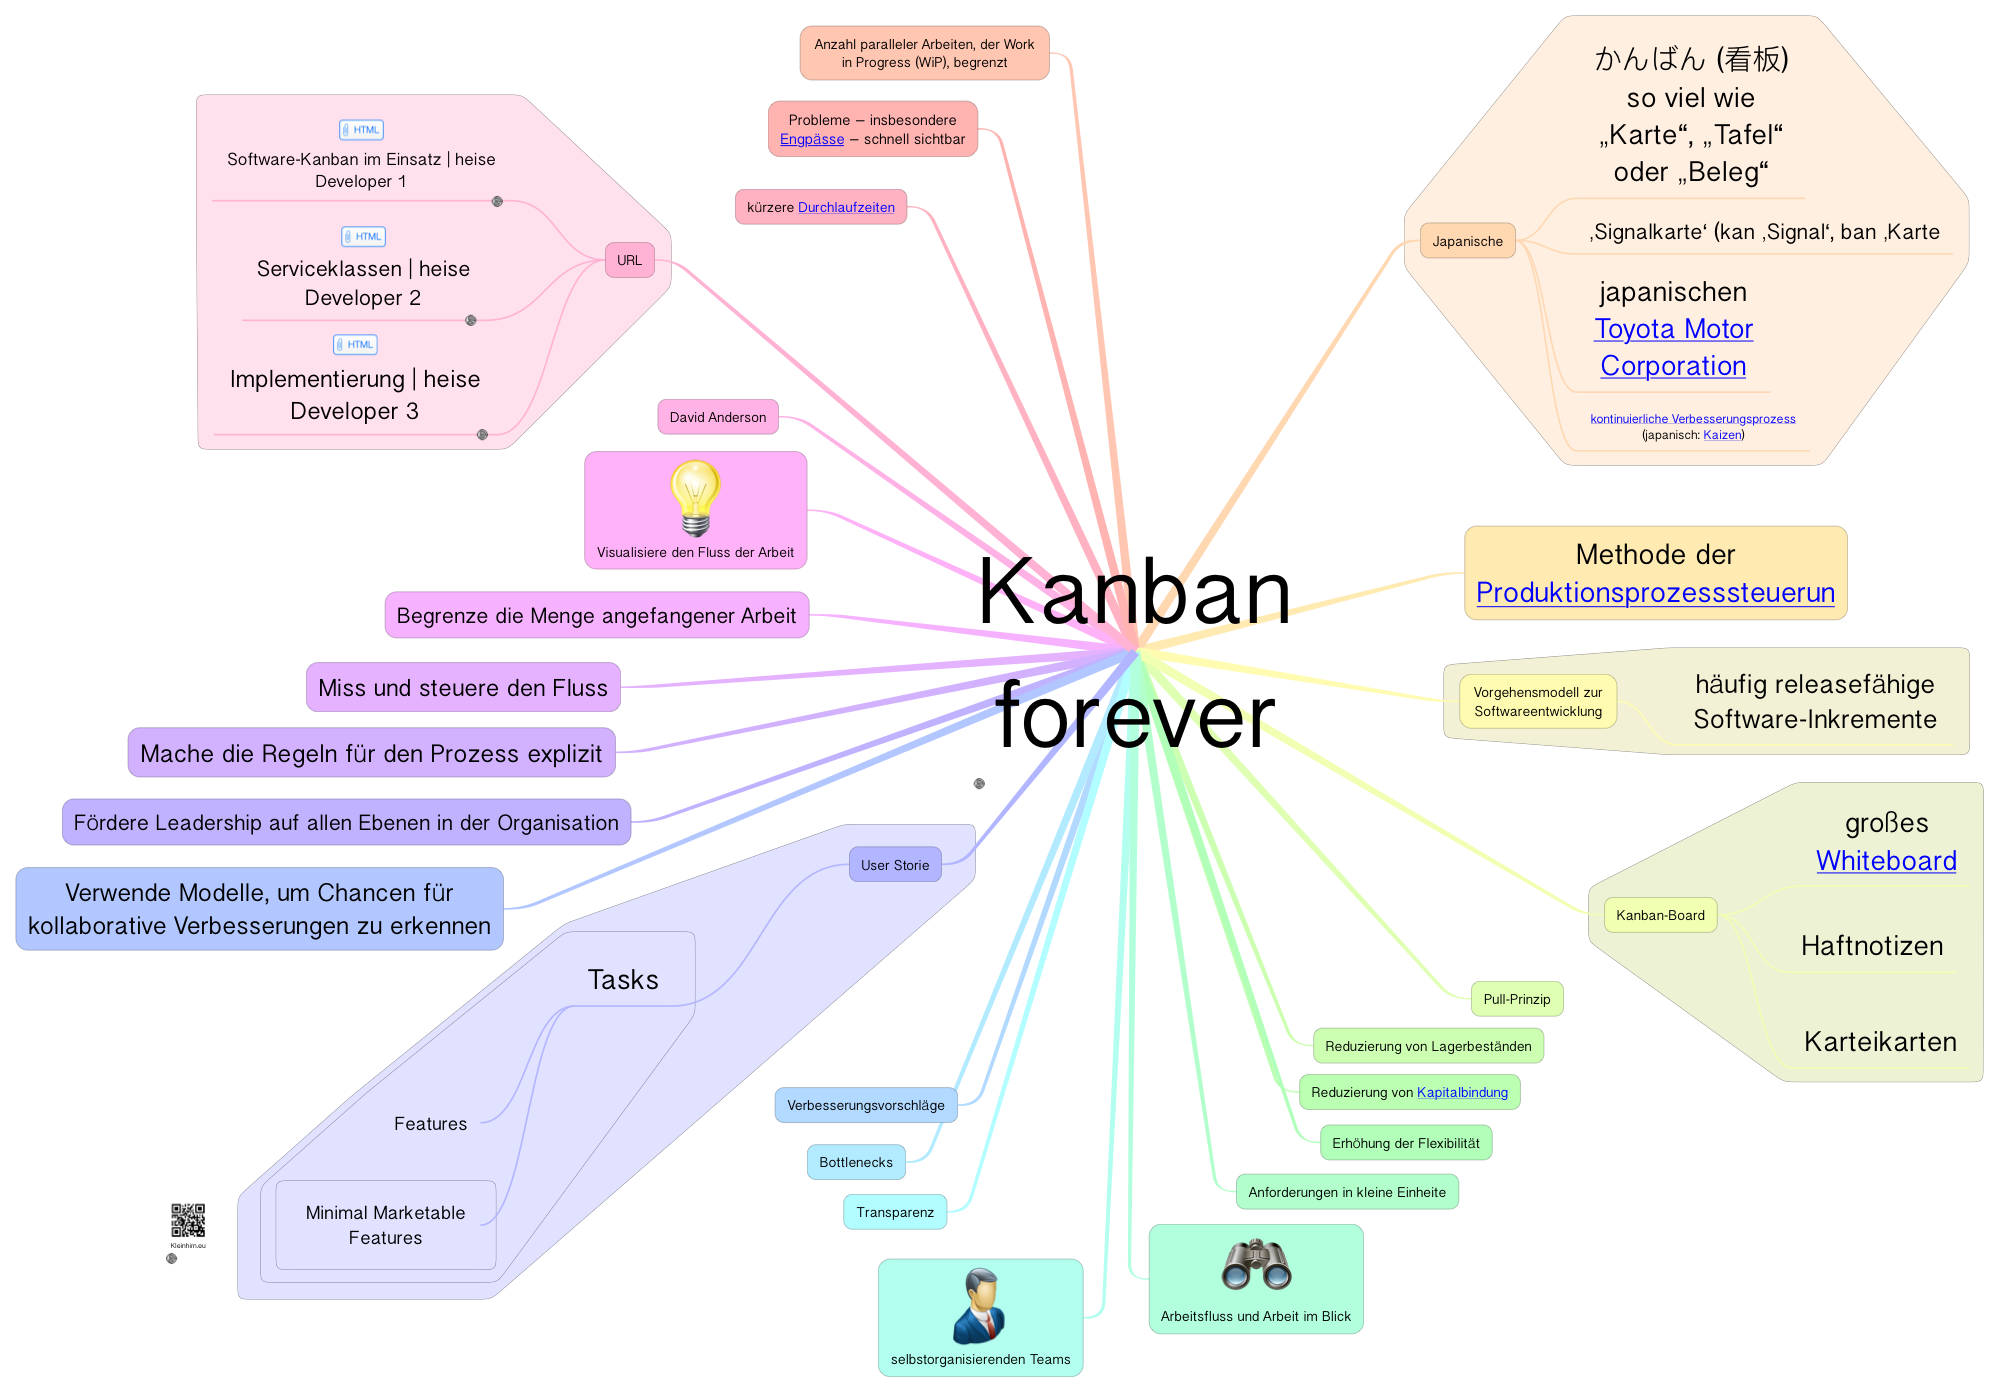 kanban-forever